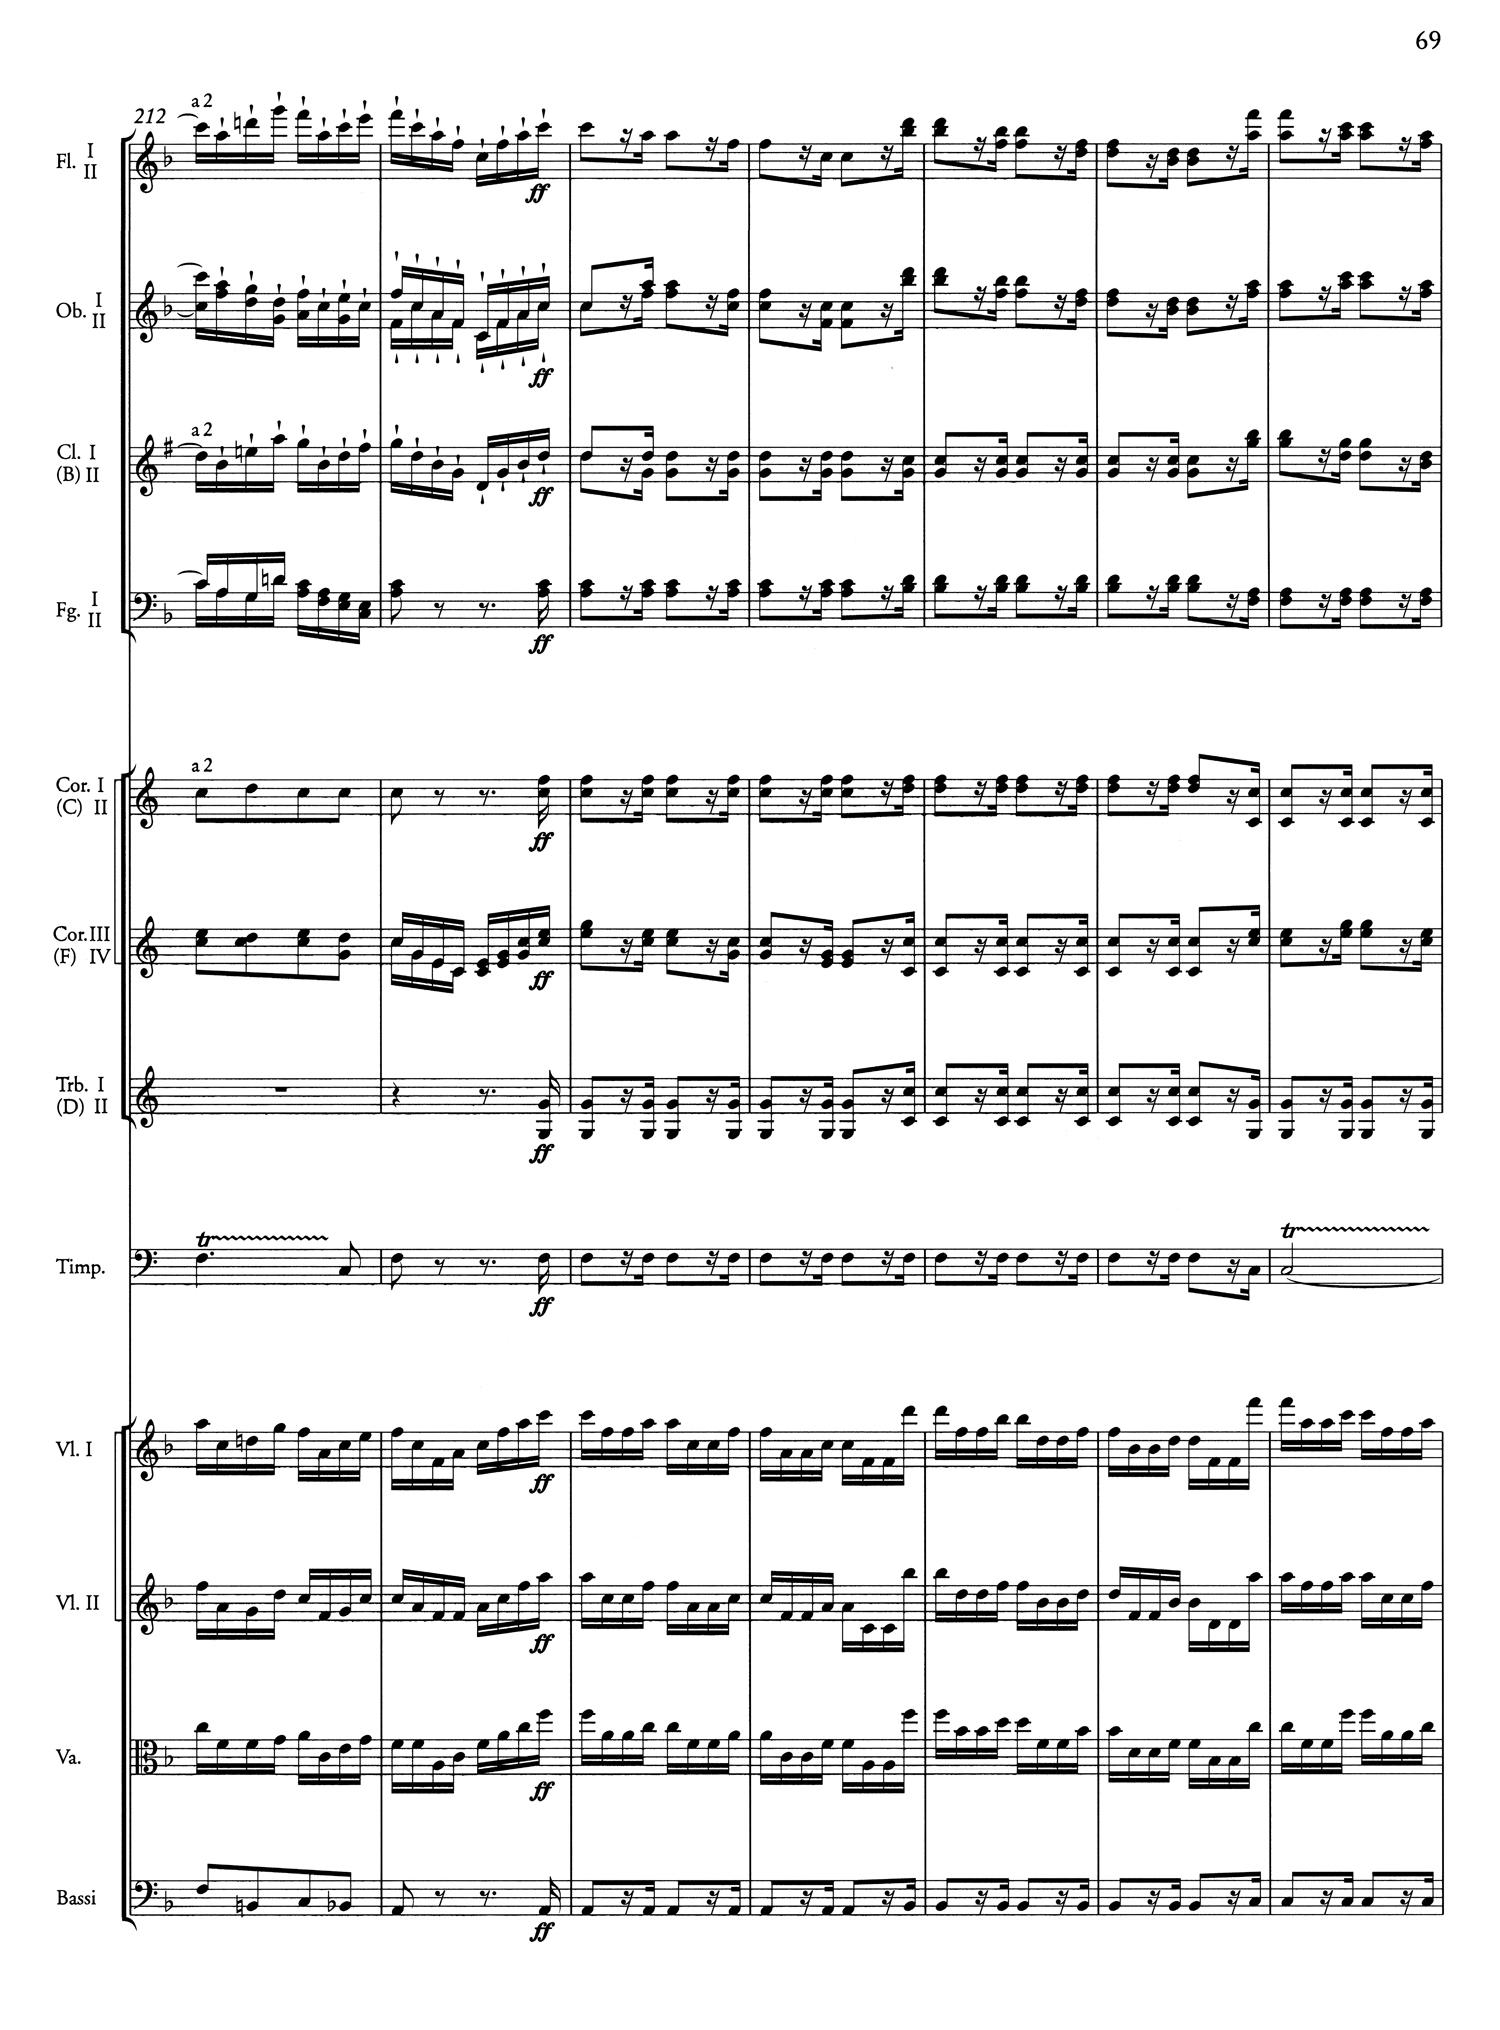 Mendelssohn Score 2 Page 5.jpg